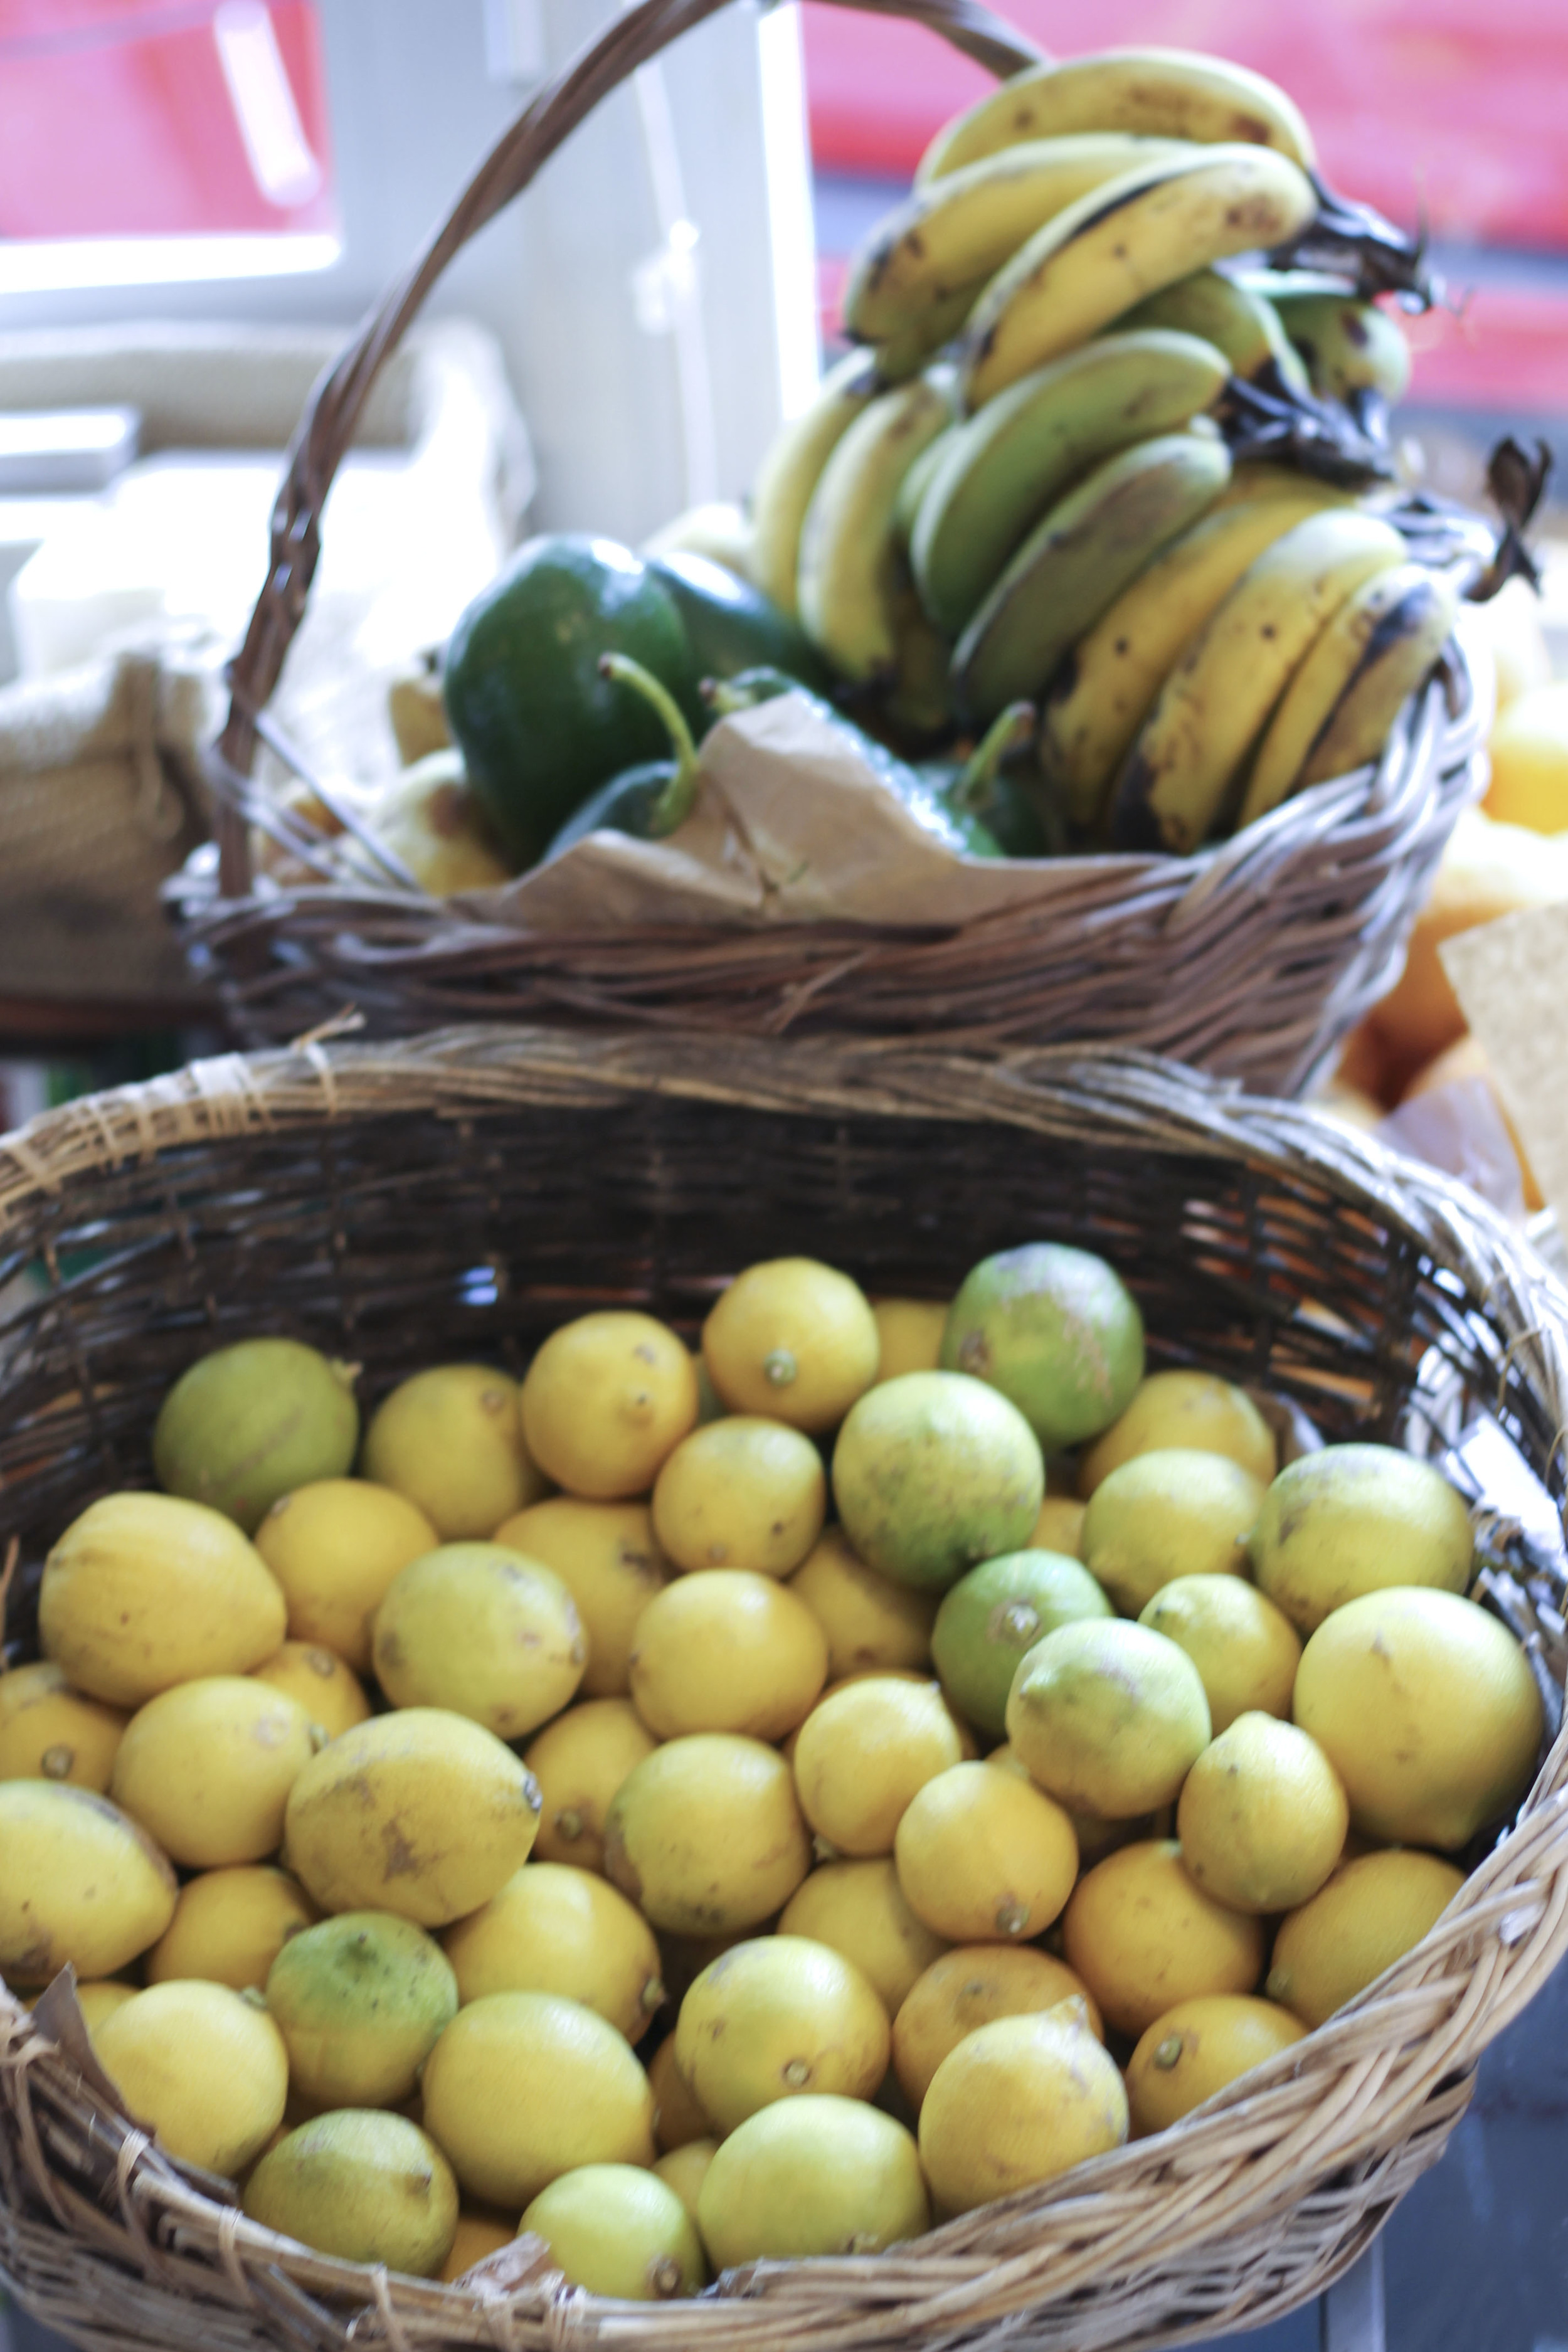 Balya oganic health food store, cihangir, istanbul2902.jpg